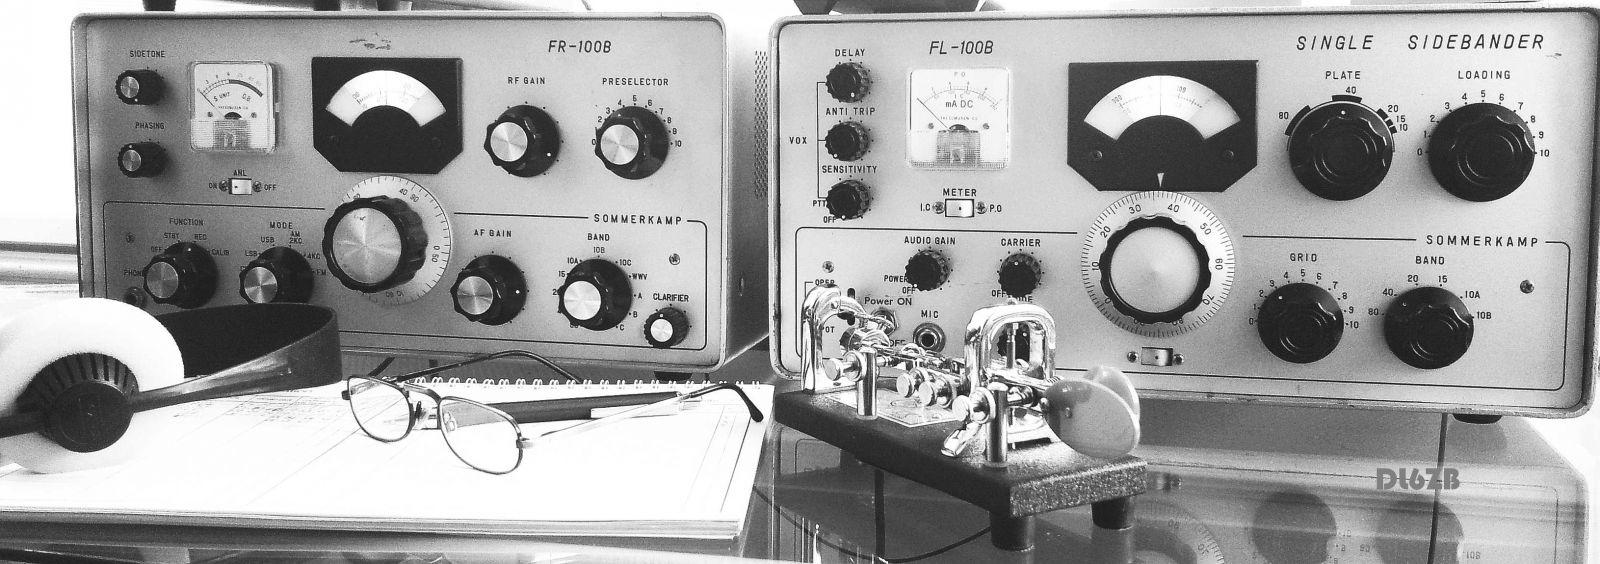 My Rig: SOMMERKAMP F-LINE - ONLY TUBES MADE IN 1964 - KEYER: VIBROPLEX BLUE RACER BUG